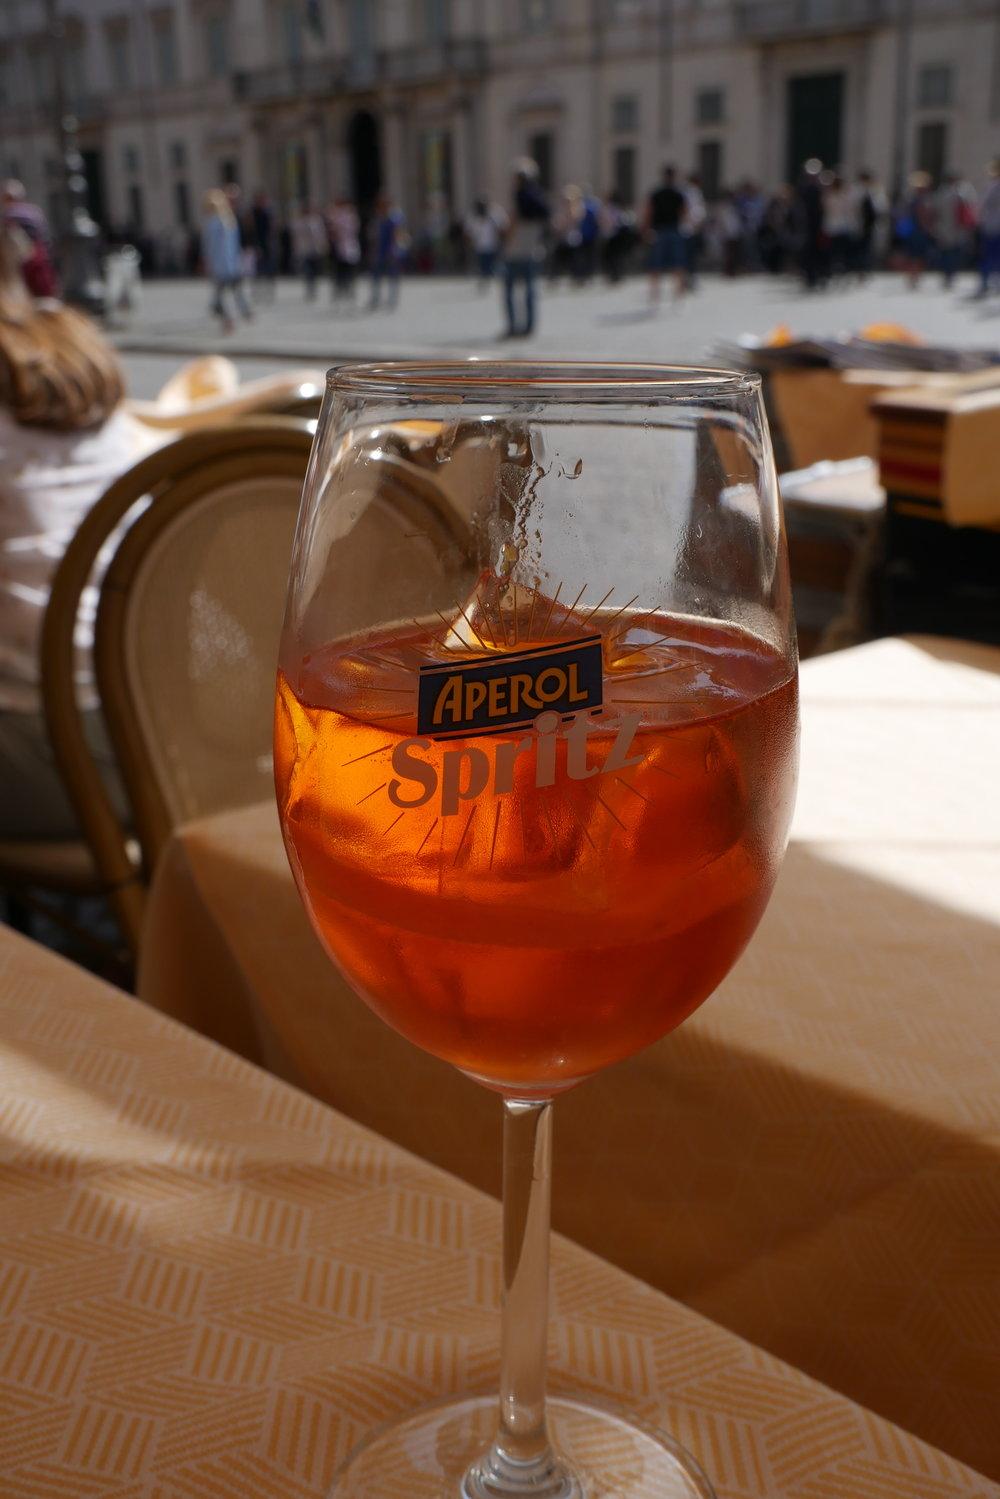 Aperol-Spritz-Rome.jpg